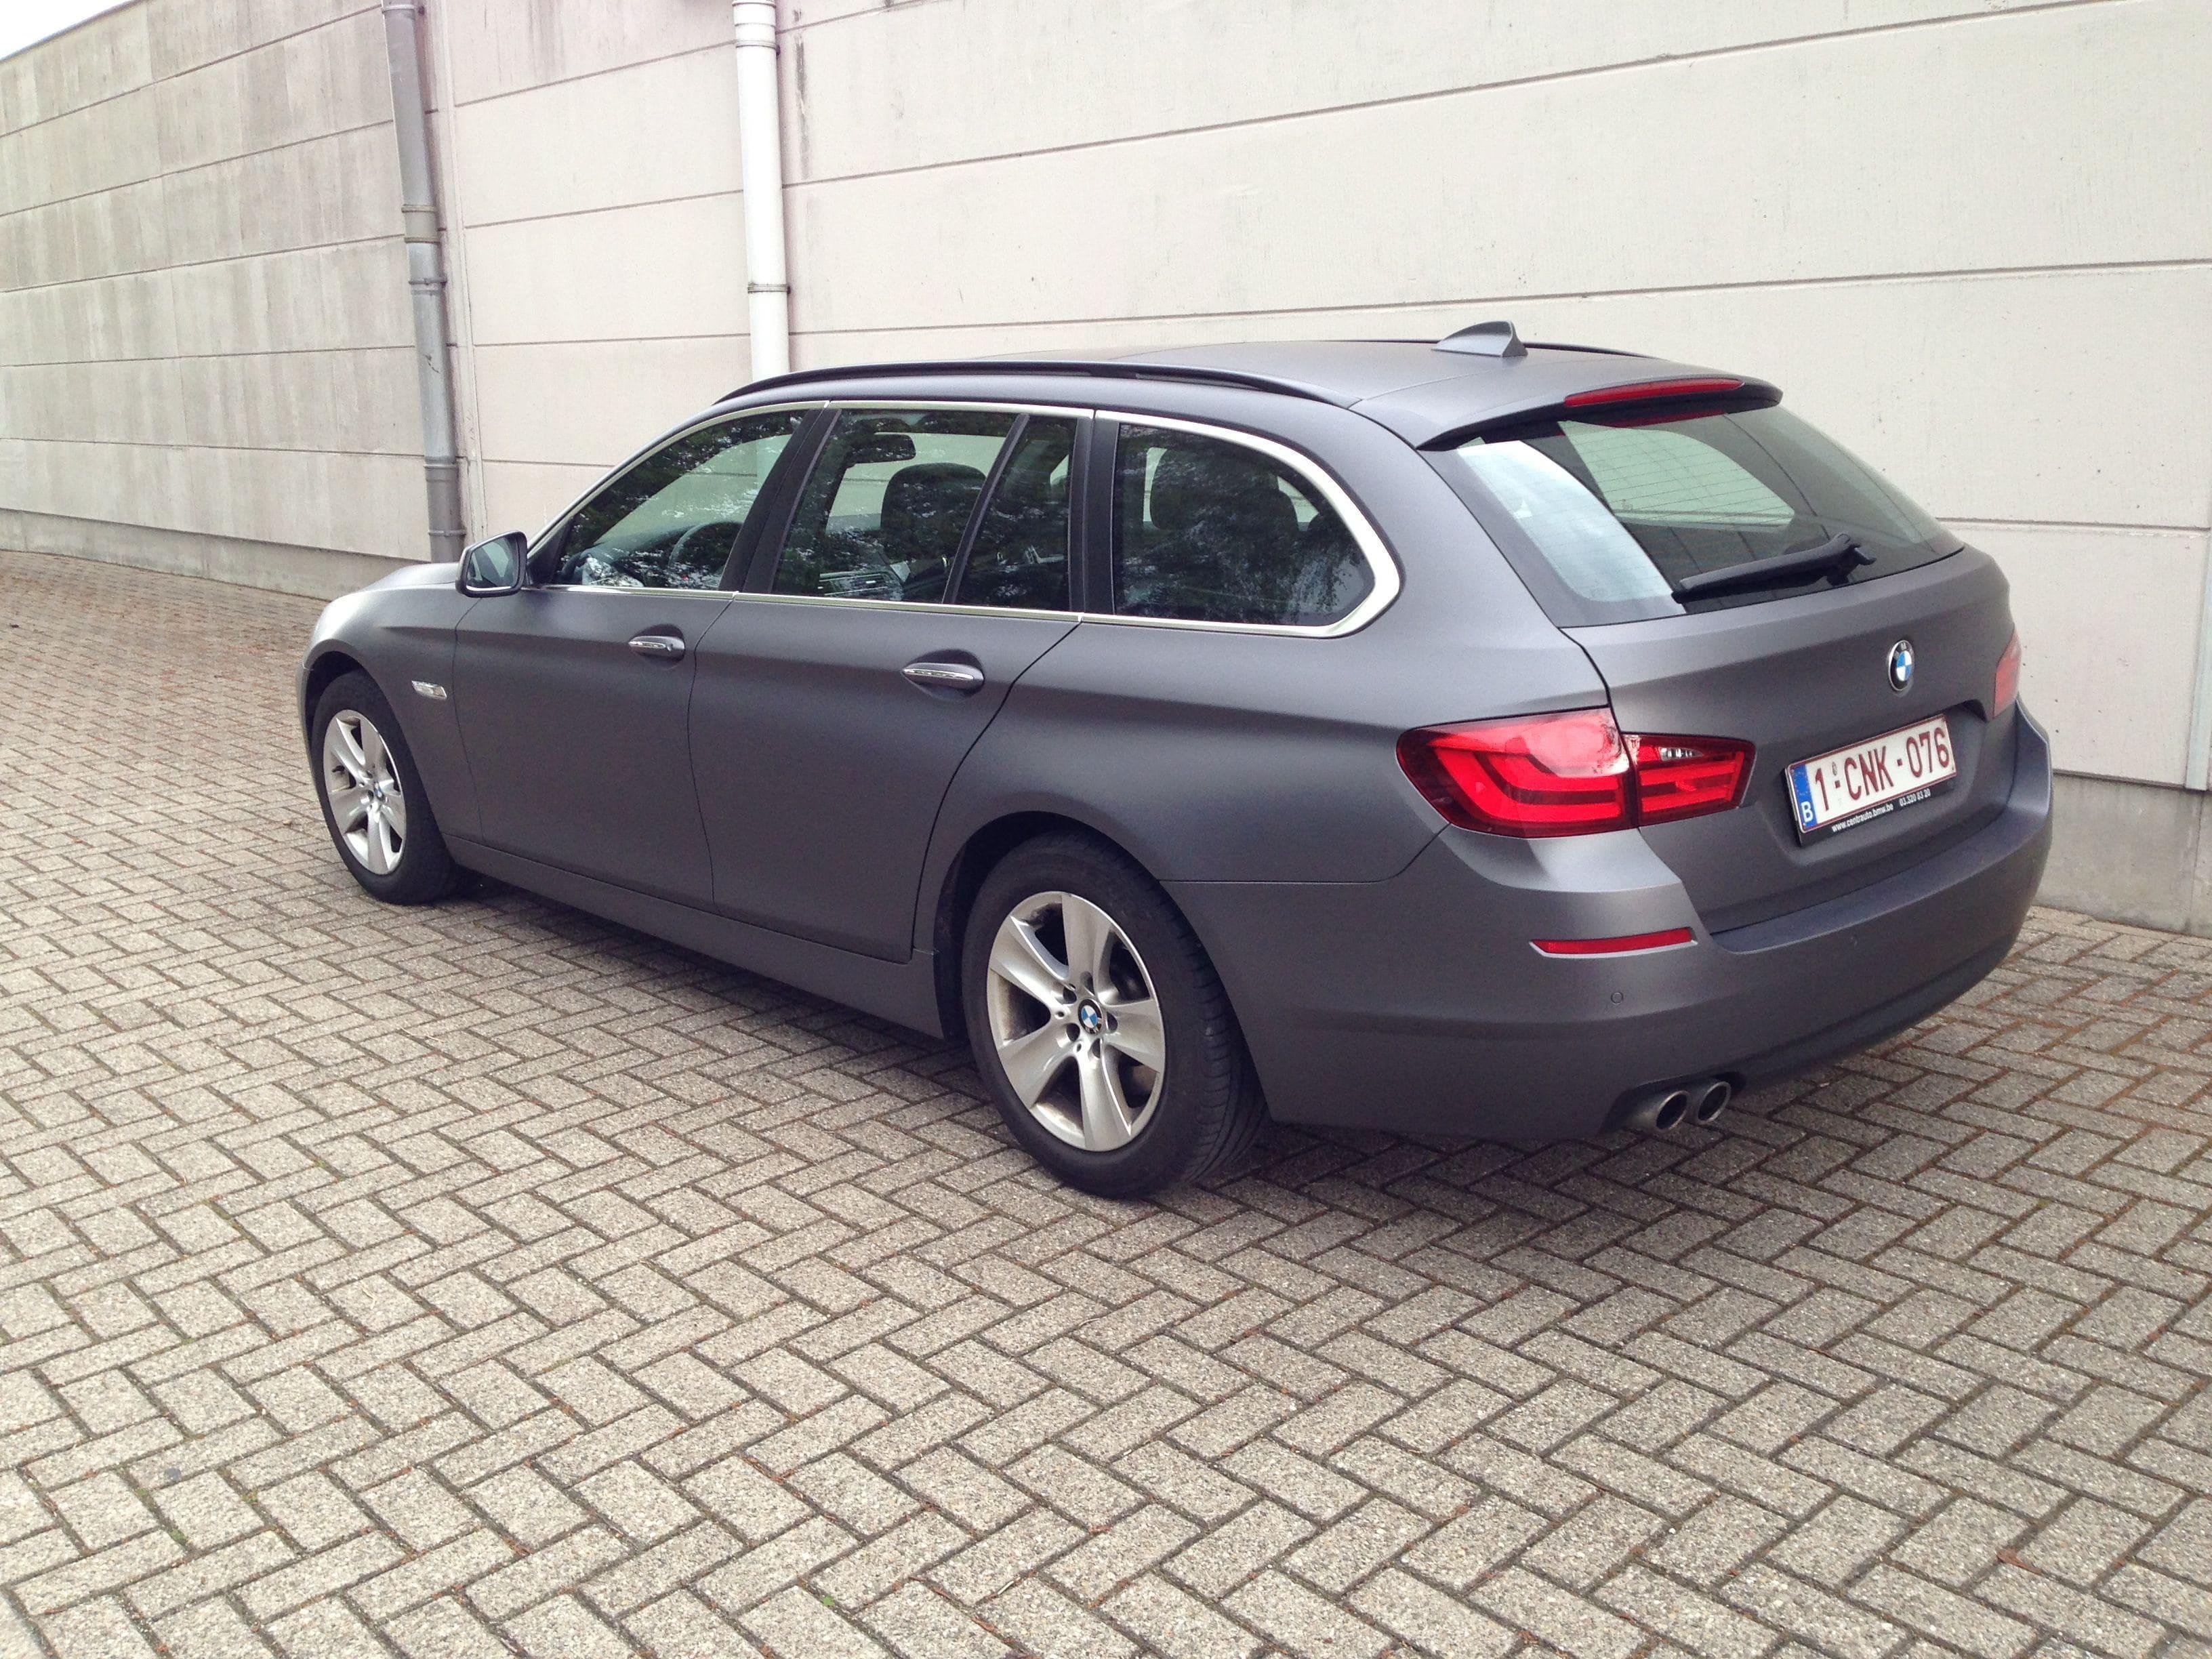 BMW 5 Serie met Gunpowder Wrap, Carwrapping door Wrapmyride.nu Foto-nr:5260, ©2021